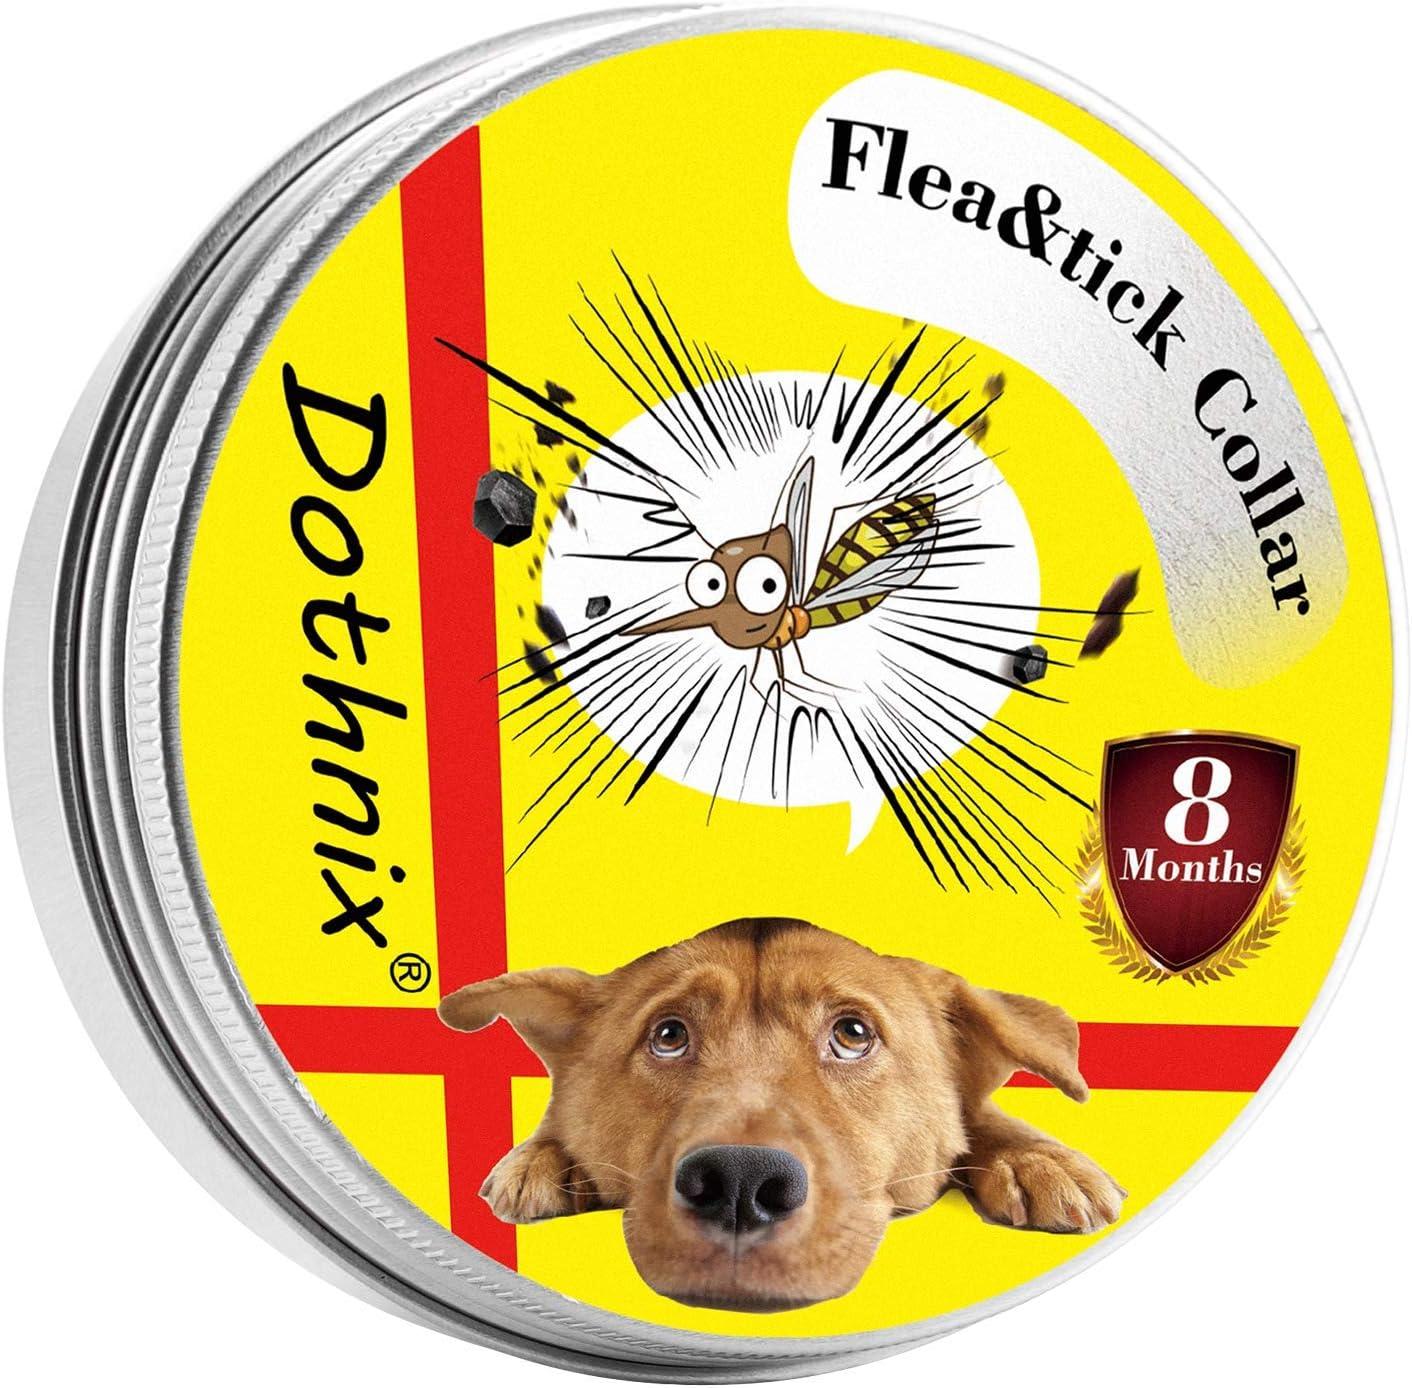 dothnix Collar Antiparasitos Antipulgas para Perros Gatos contra Pulgas,Garrapatas y Mosquitos,8 Meses,Tamaño Ajustable e Impermeable para Mascota Pequeño Mediano Grandes(55cm)